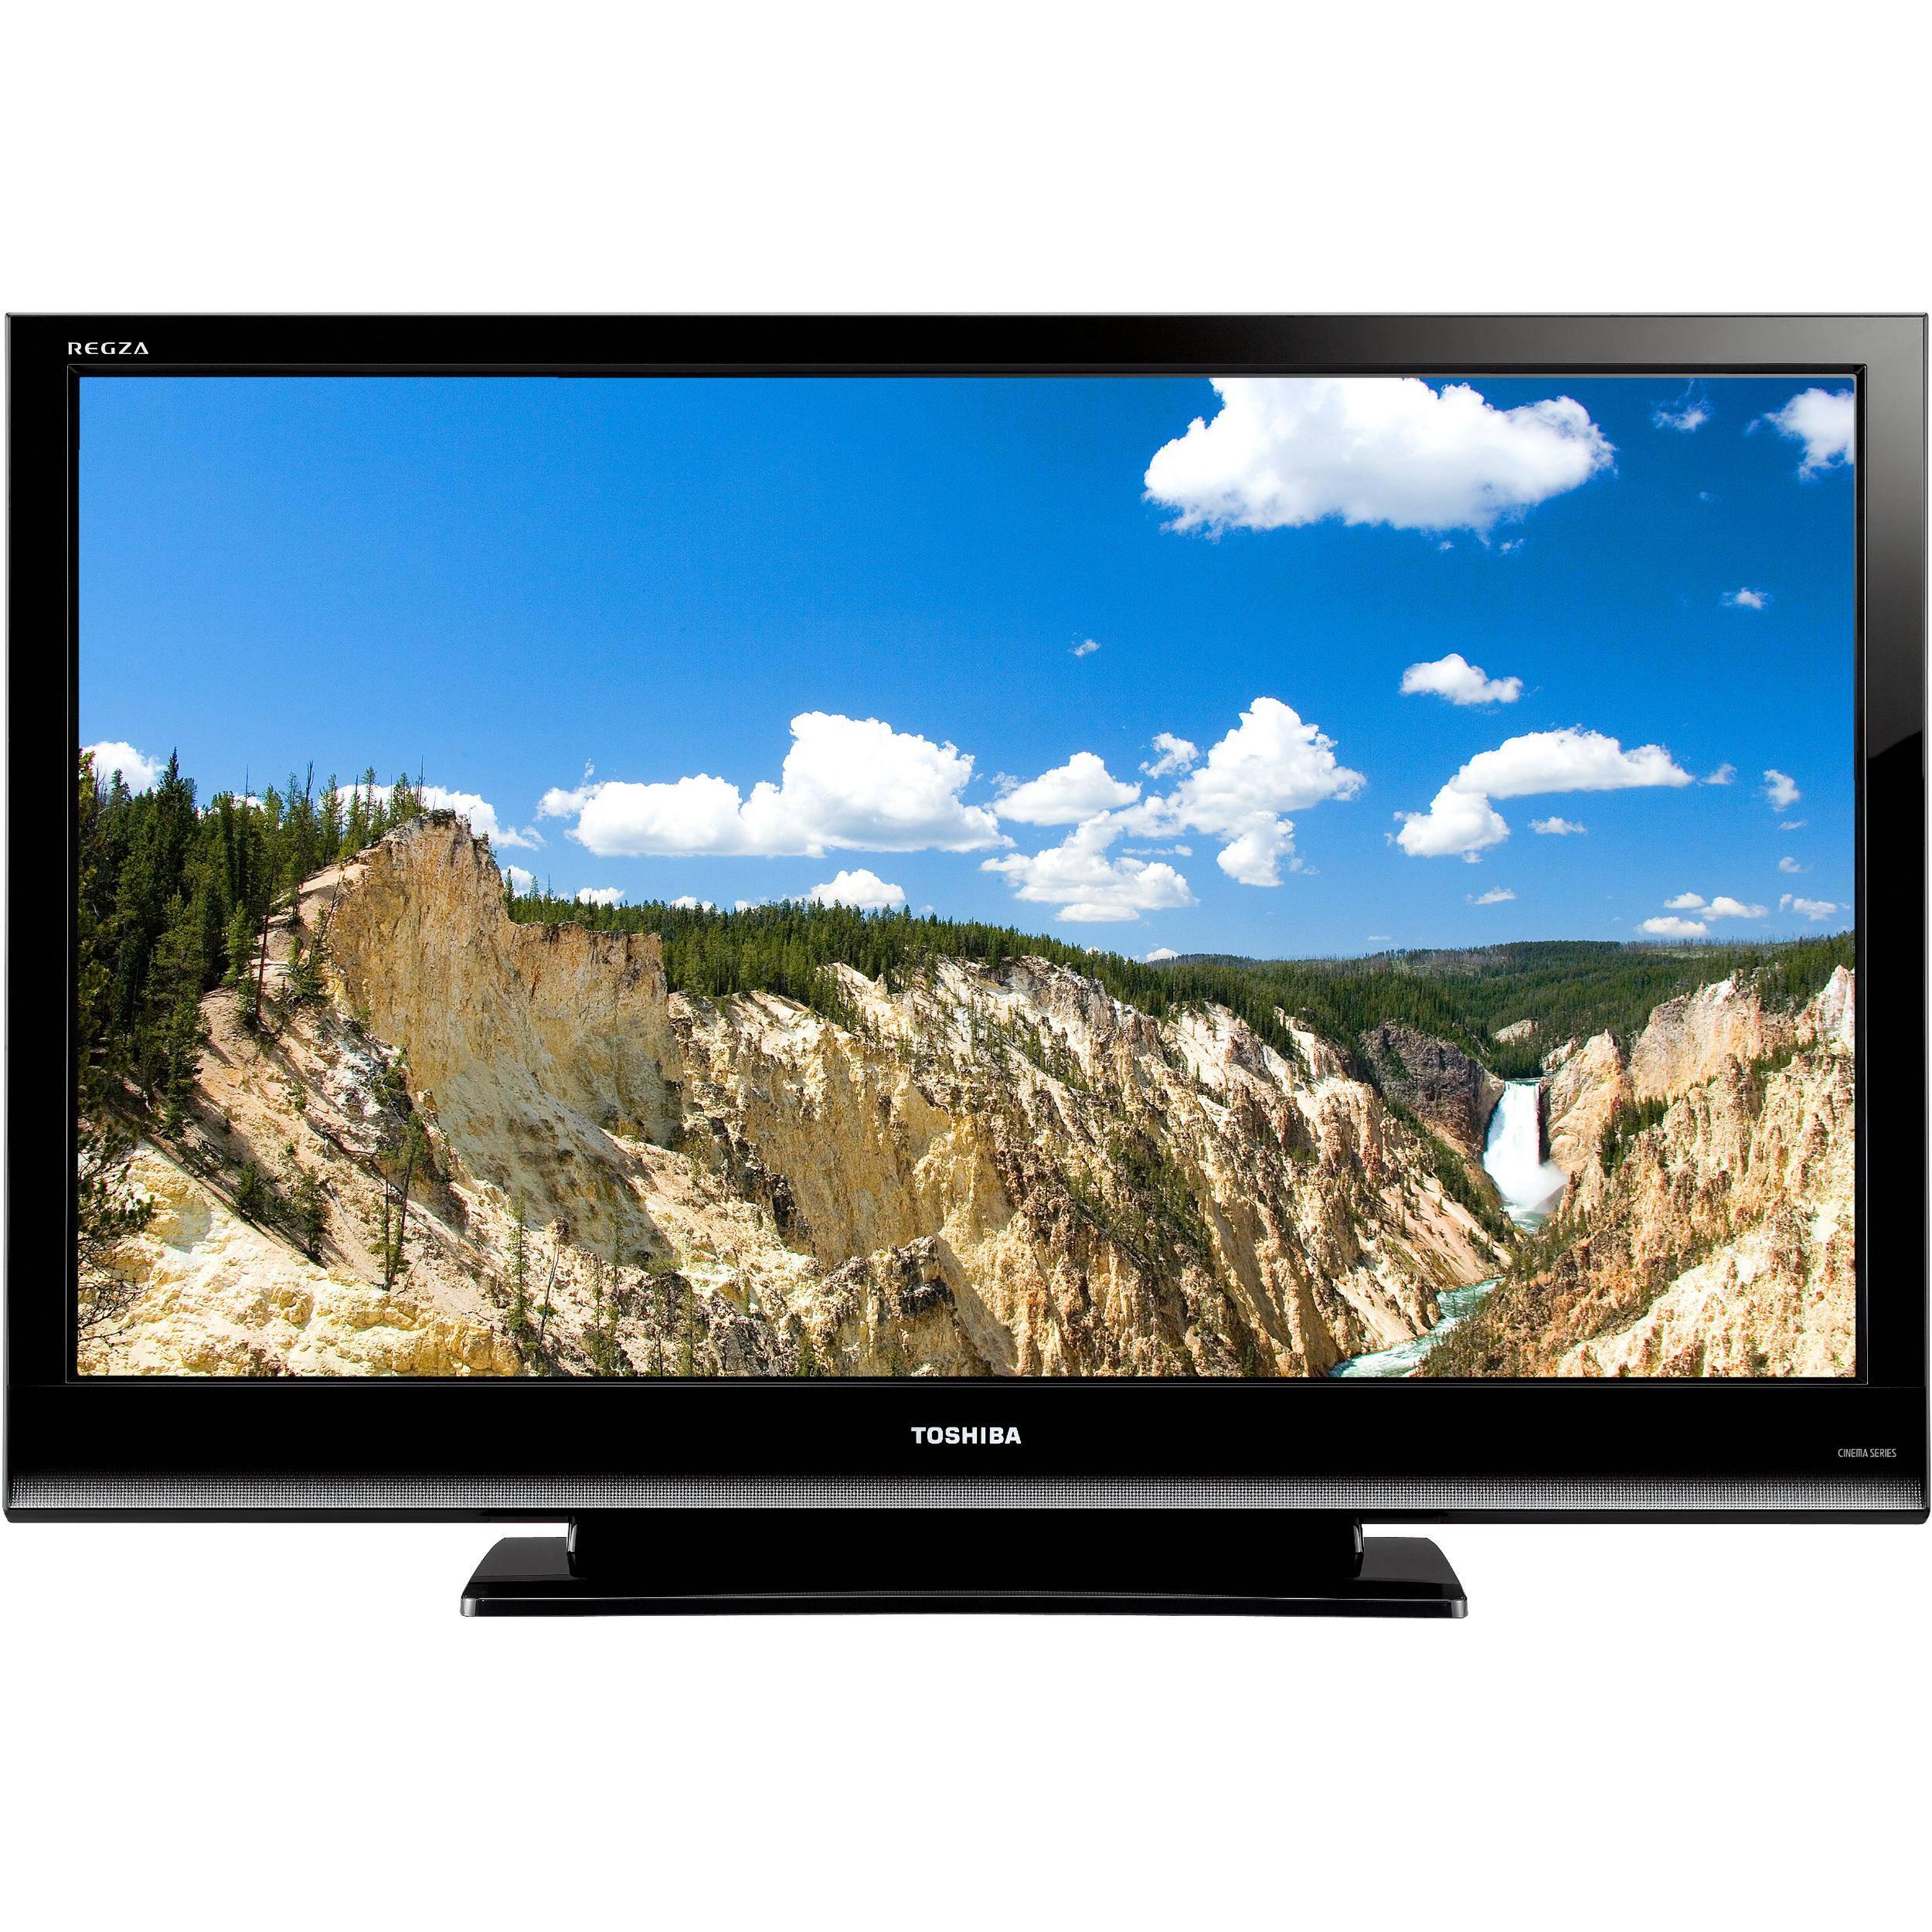 toshiba 40xv648 40 regza 1080p hd lcd tv 40xv648 b h photo. Black Bedroom Furniture Sets. Home Design Ideas